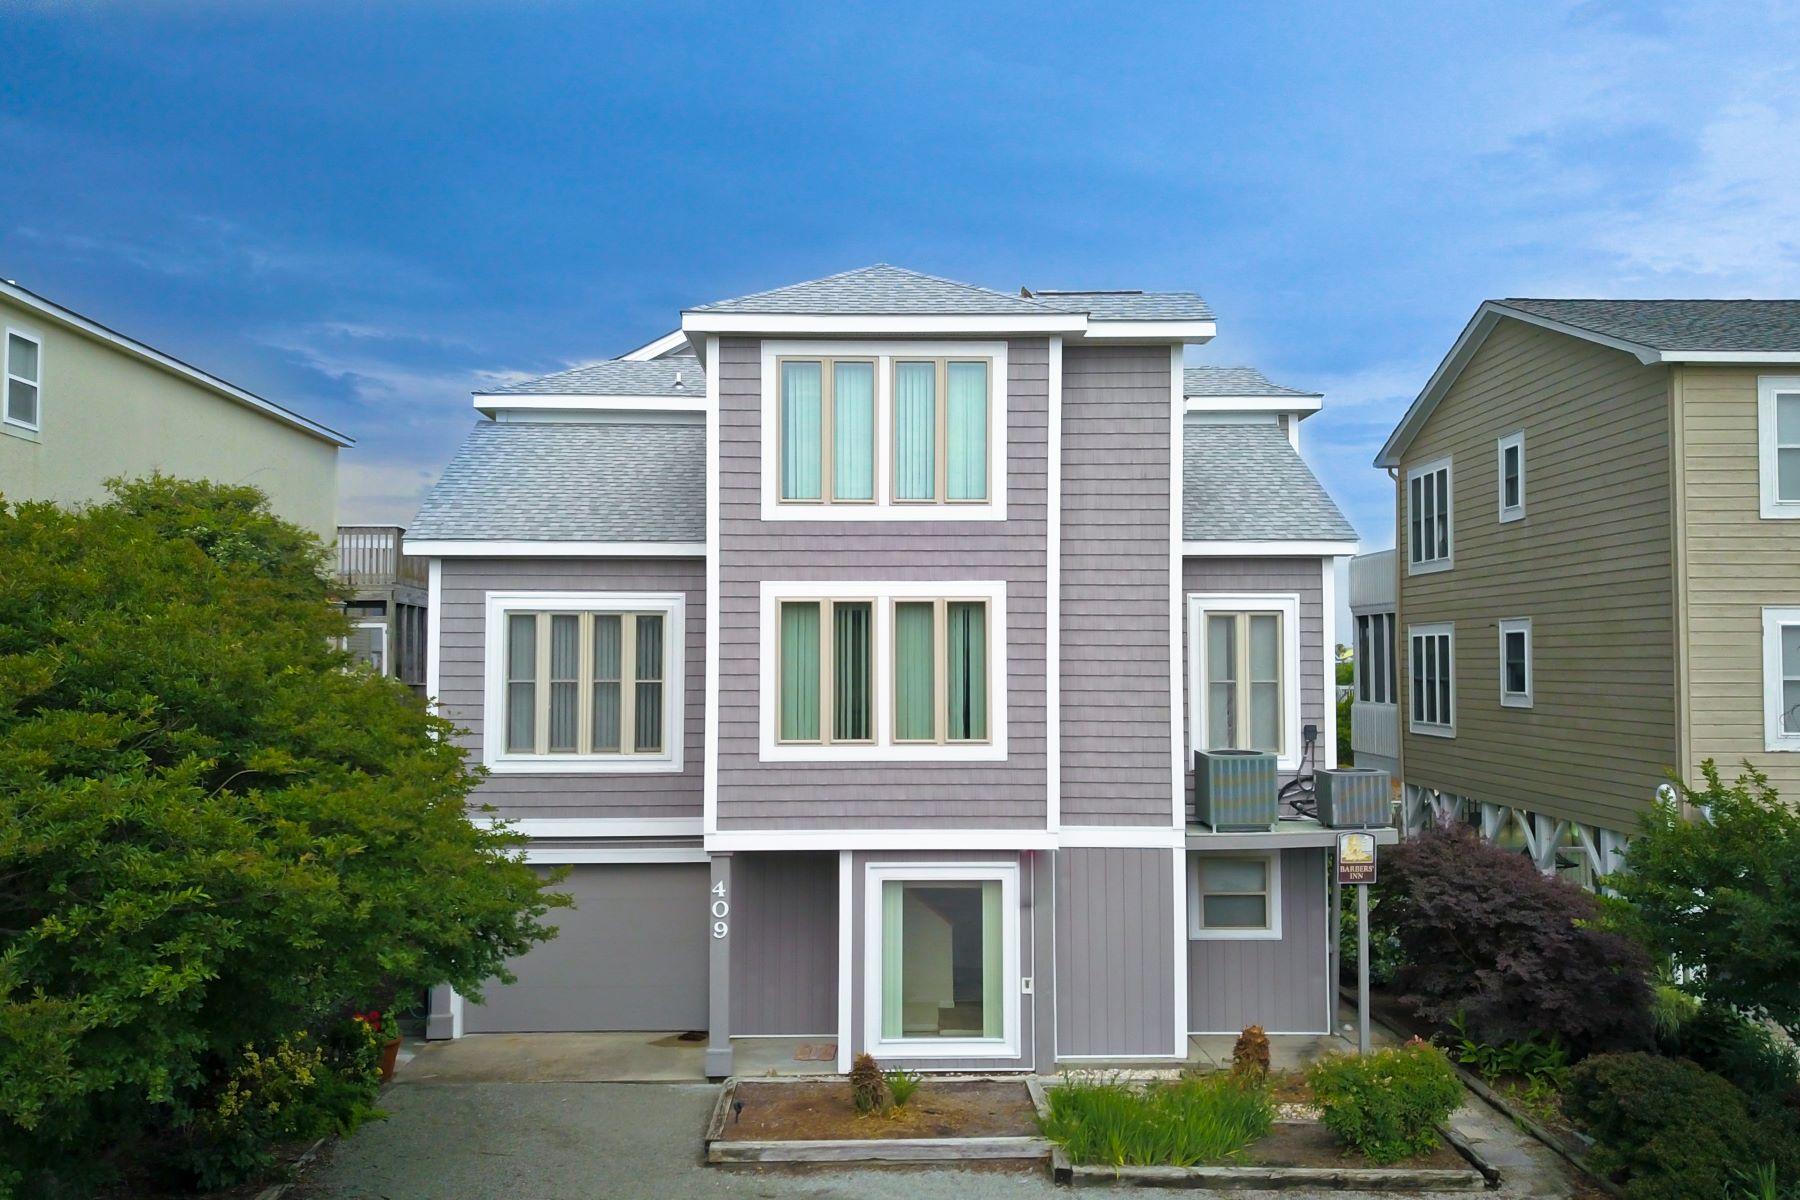 Single Family Homes για την Πώληση στο Peaceful and Inviting Canal Front Home 409 Dolphin Street, Sunset Beach, Βορεια Καρολινα 28468 Ηνωμένες Πολιτείες